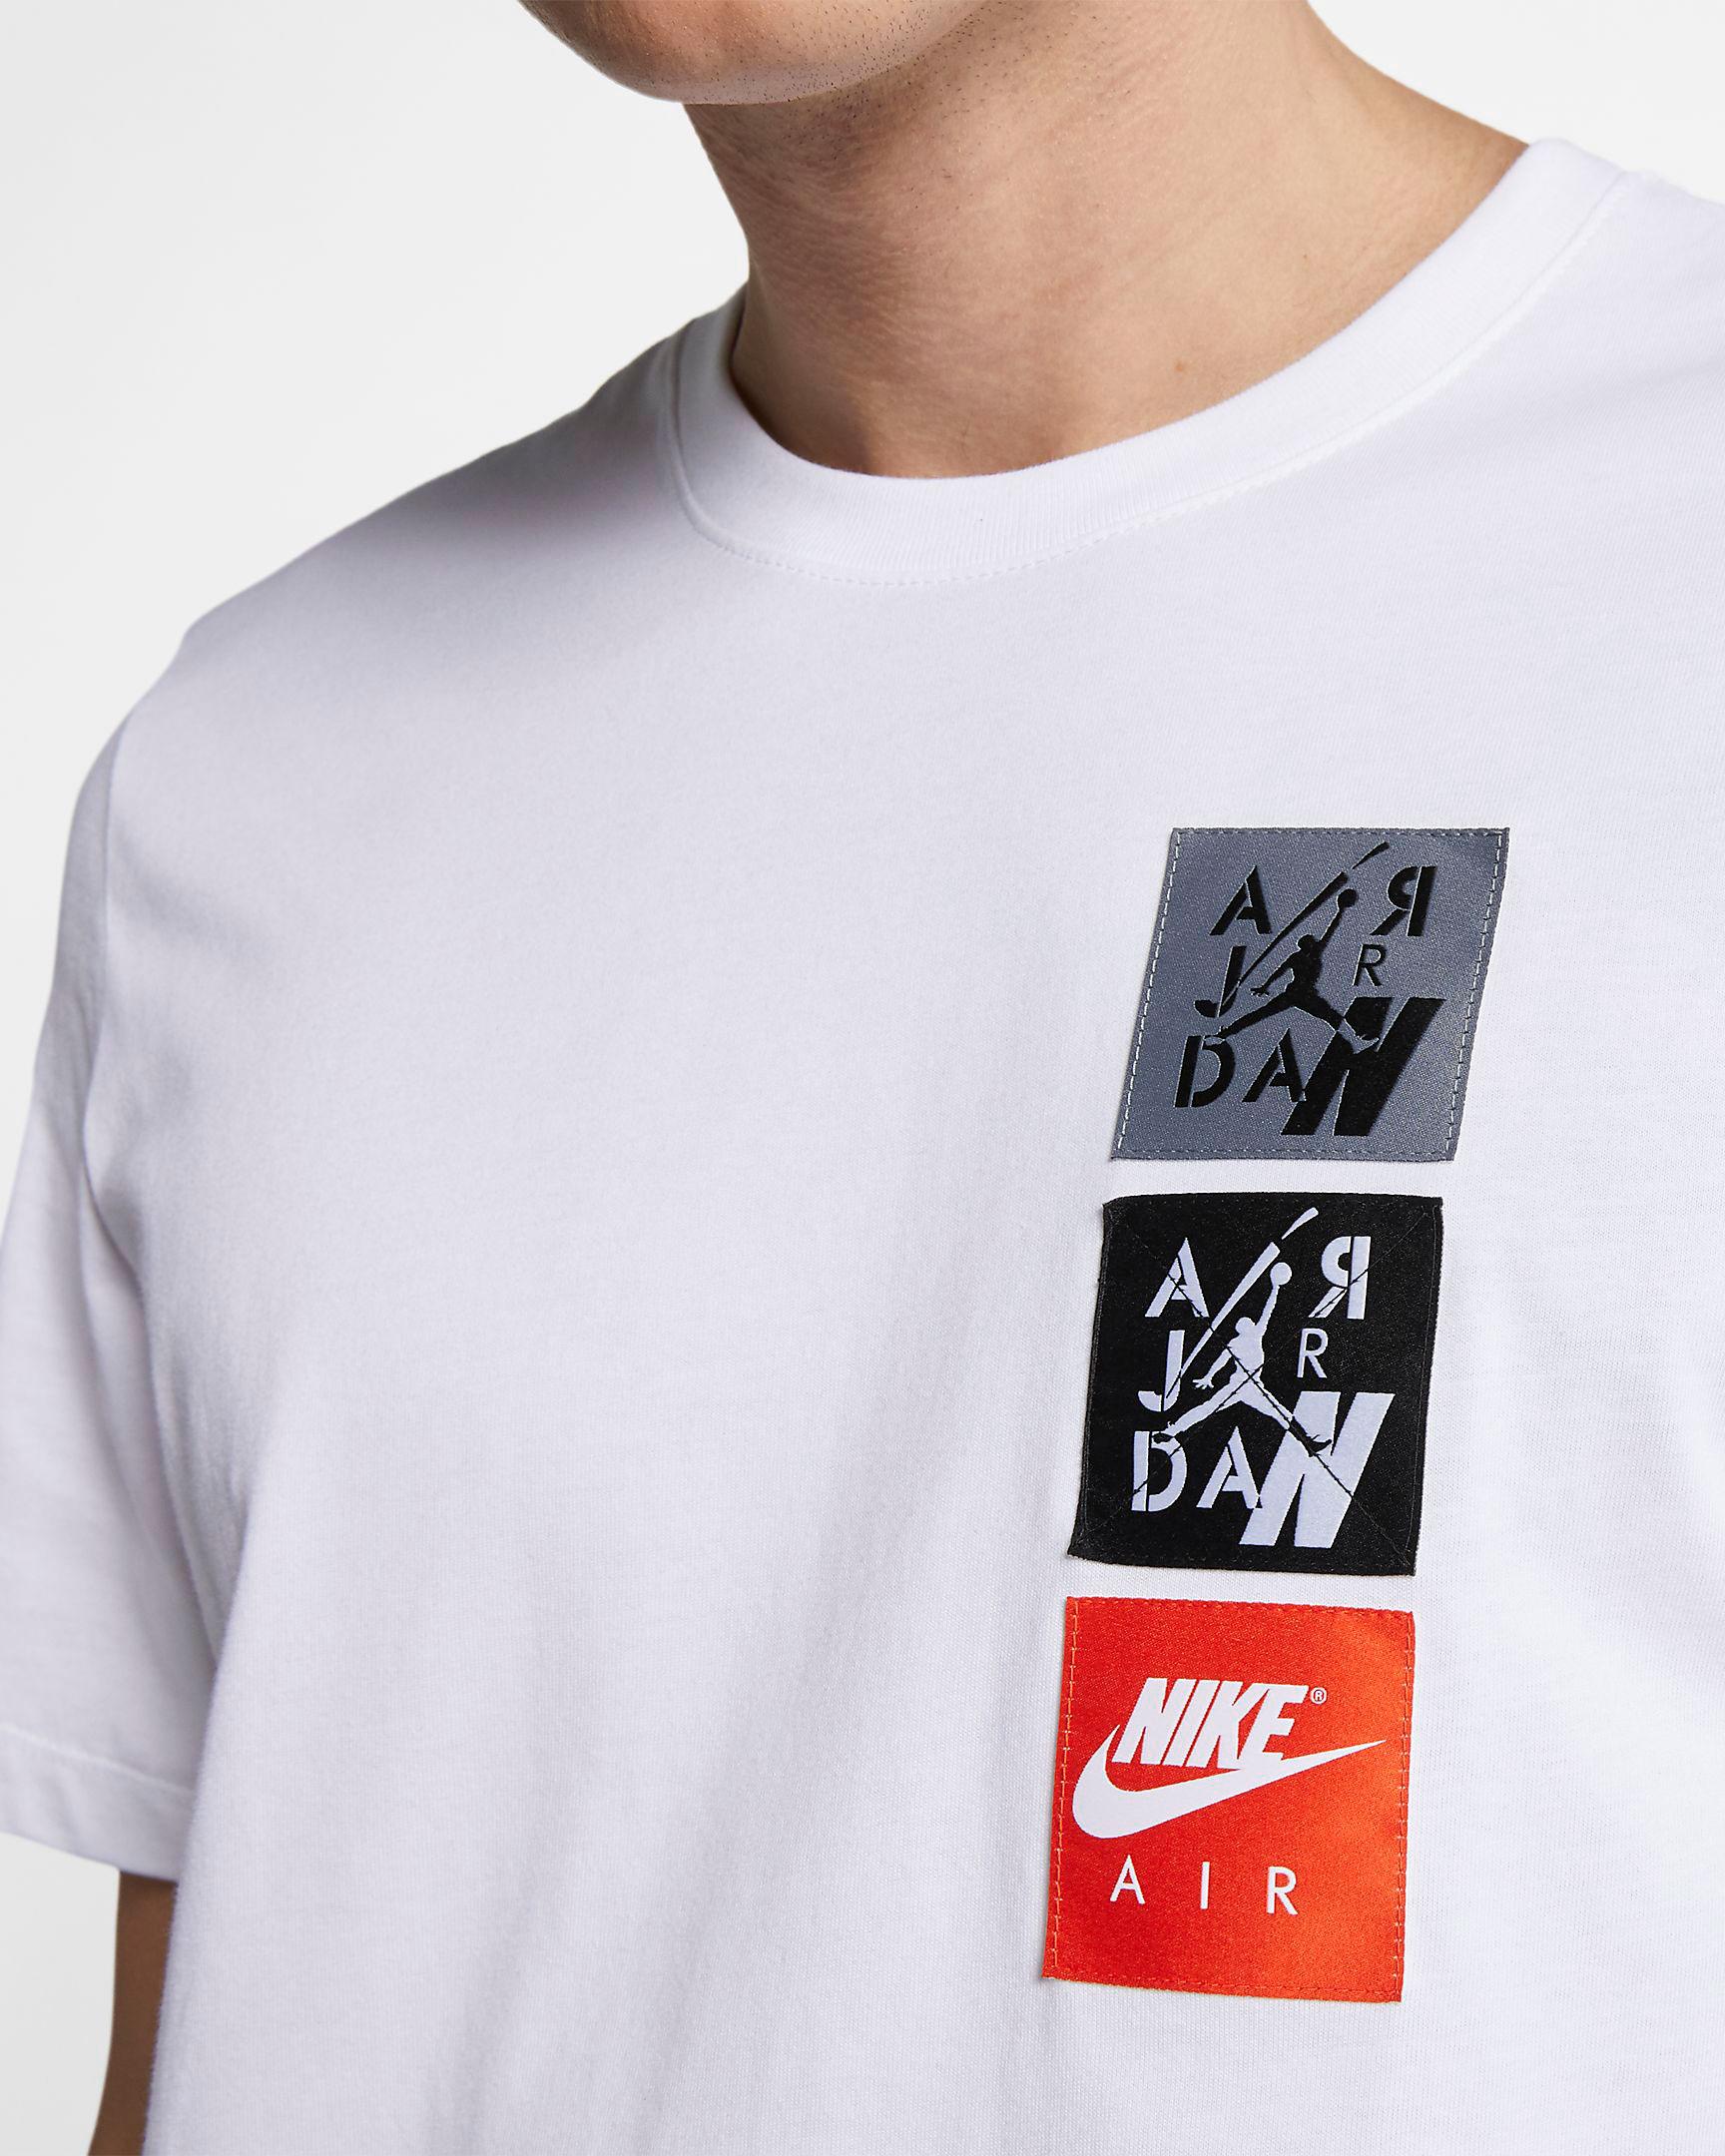 Air Jordan 4 Bred 2019 Clothing Shirts